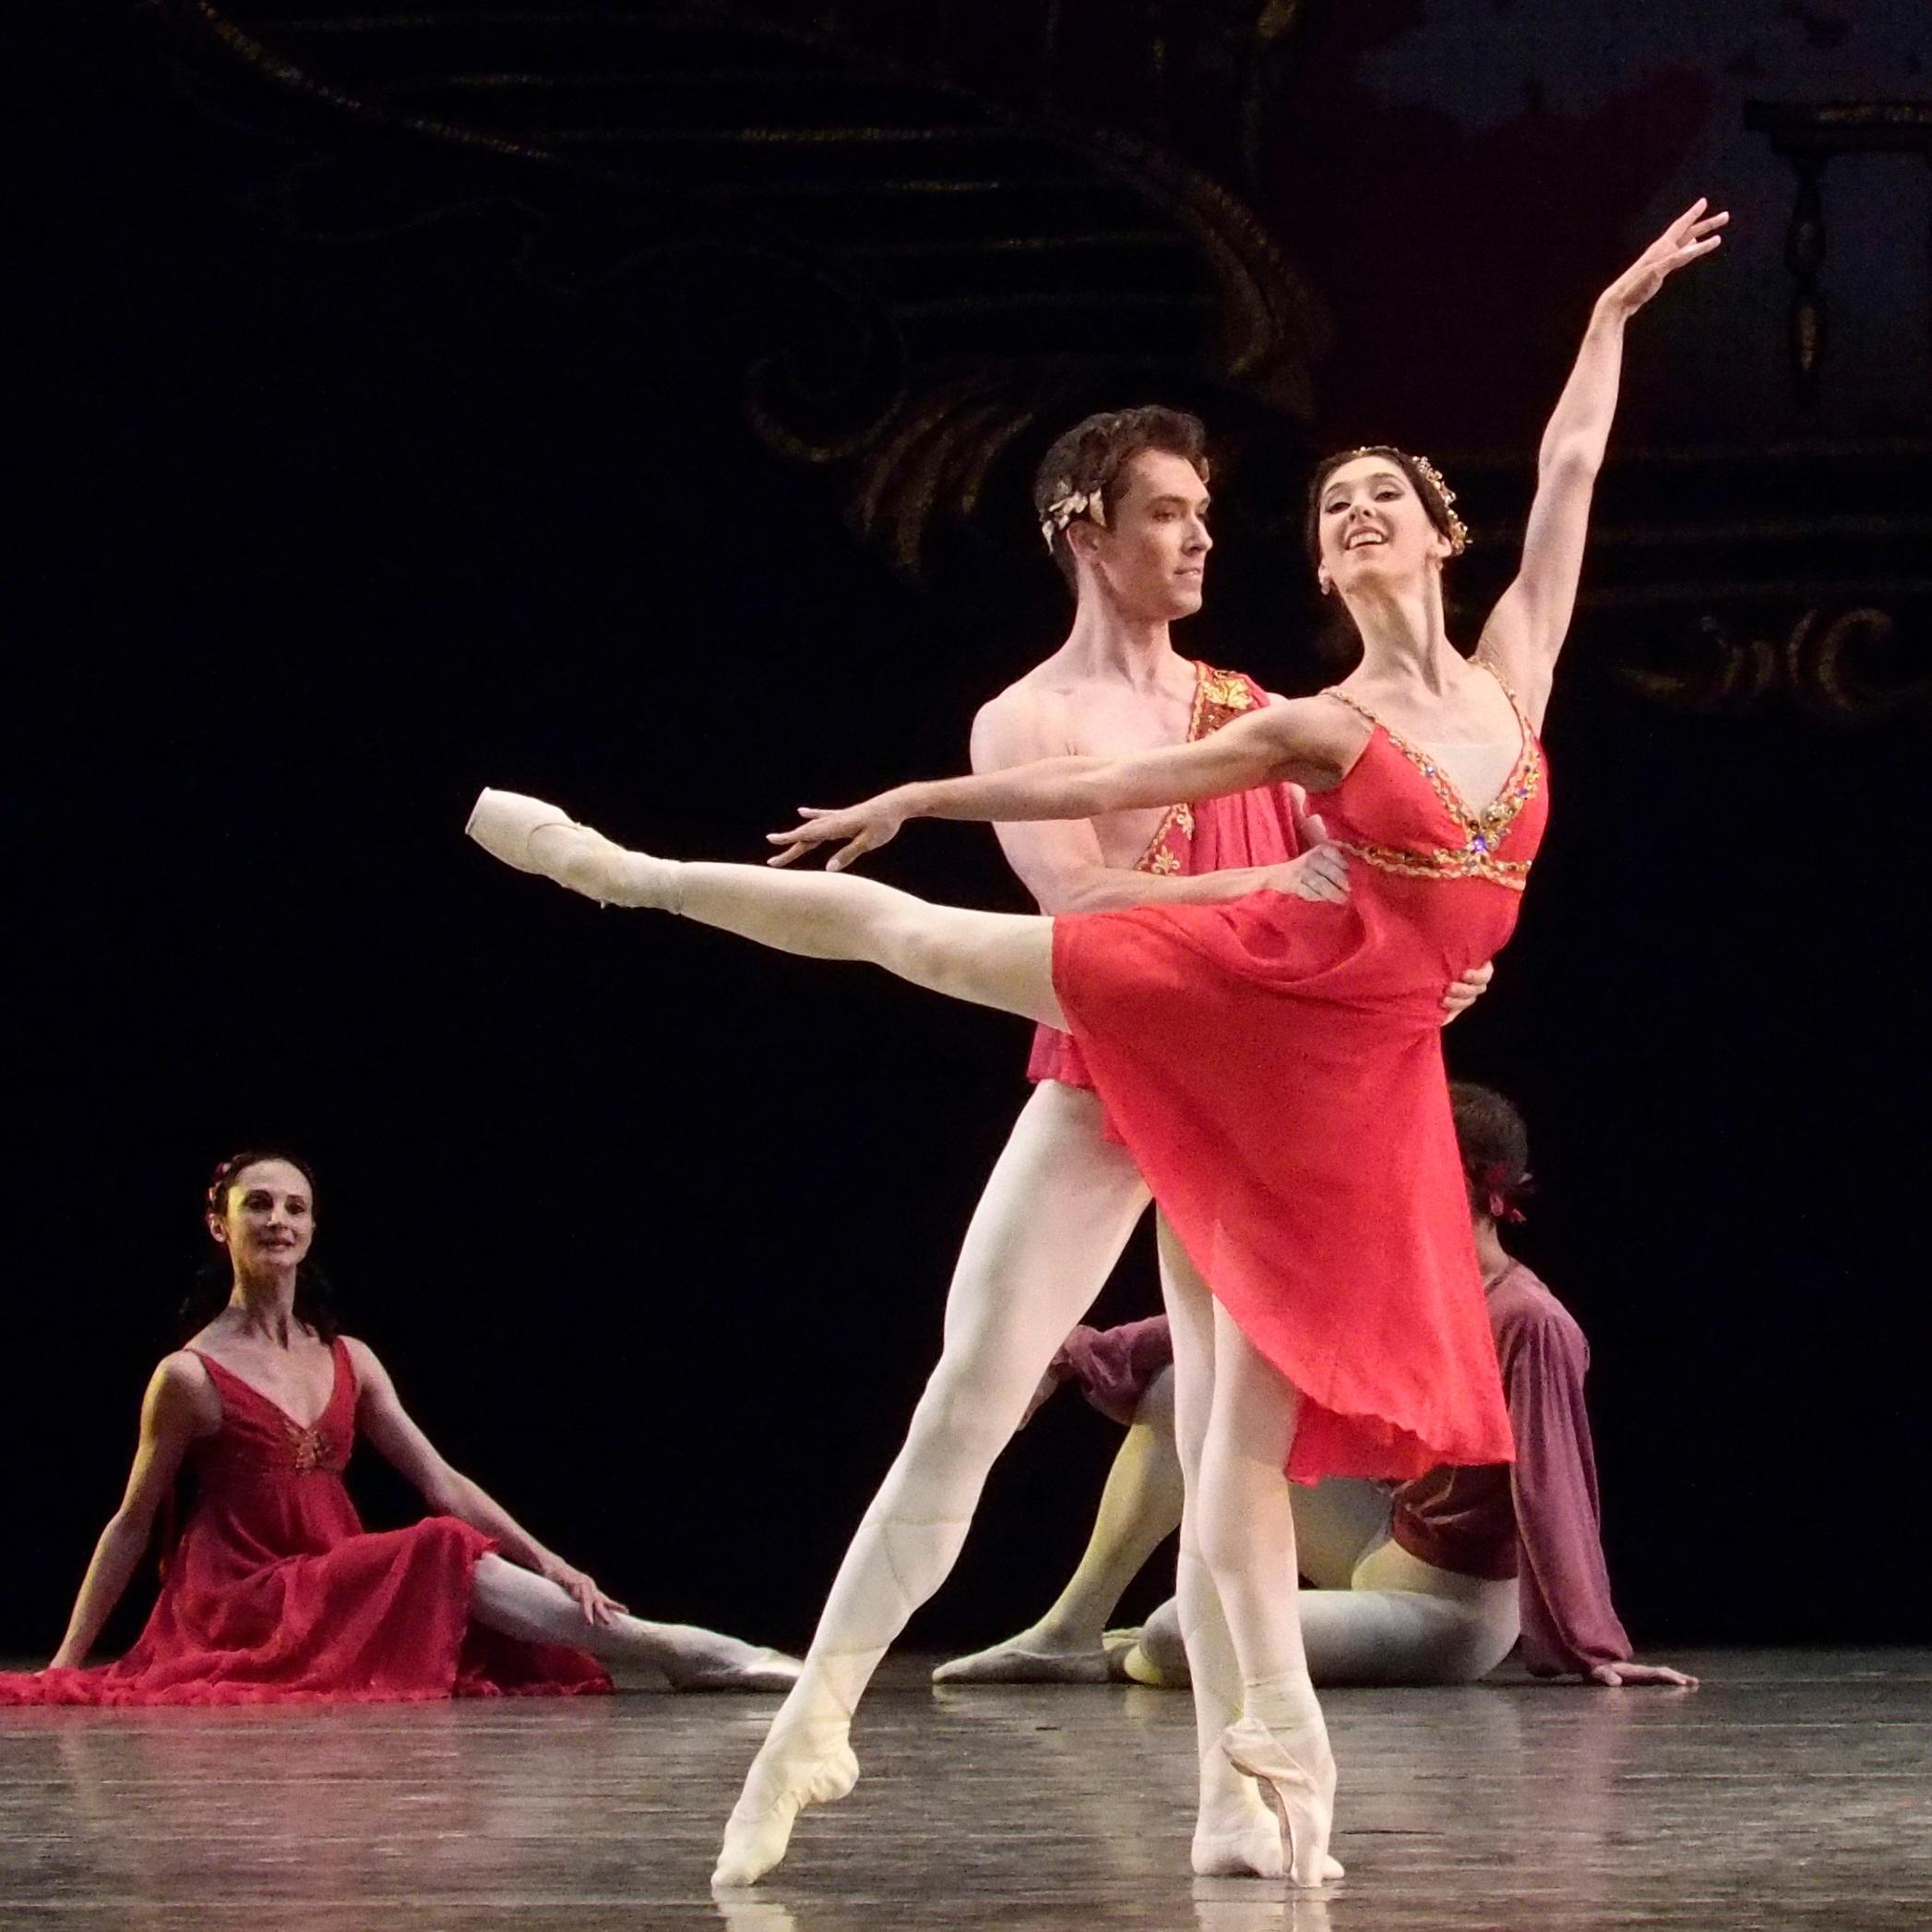 PERM OPERA BALLET Principal Dancers Polina buldakova and Nikita Chetverikov. FOUR SEASONS  Photo by Vladimir Lupovkoy for RUS ART